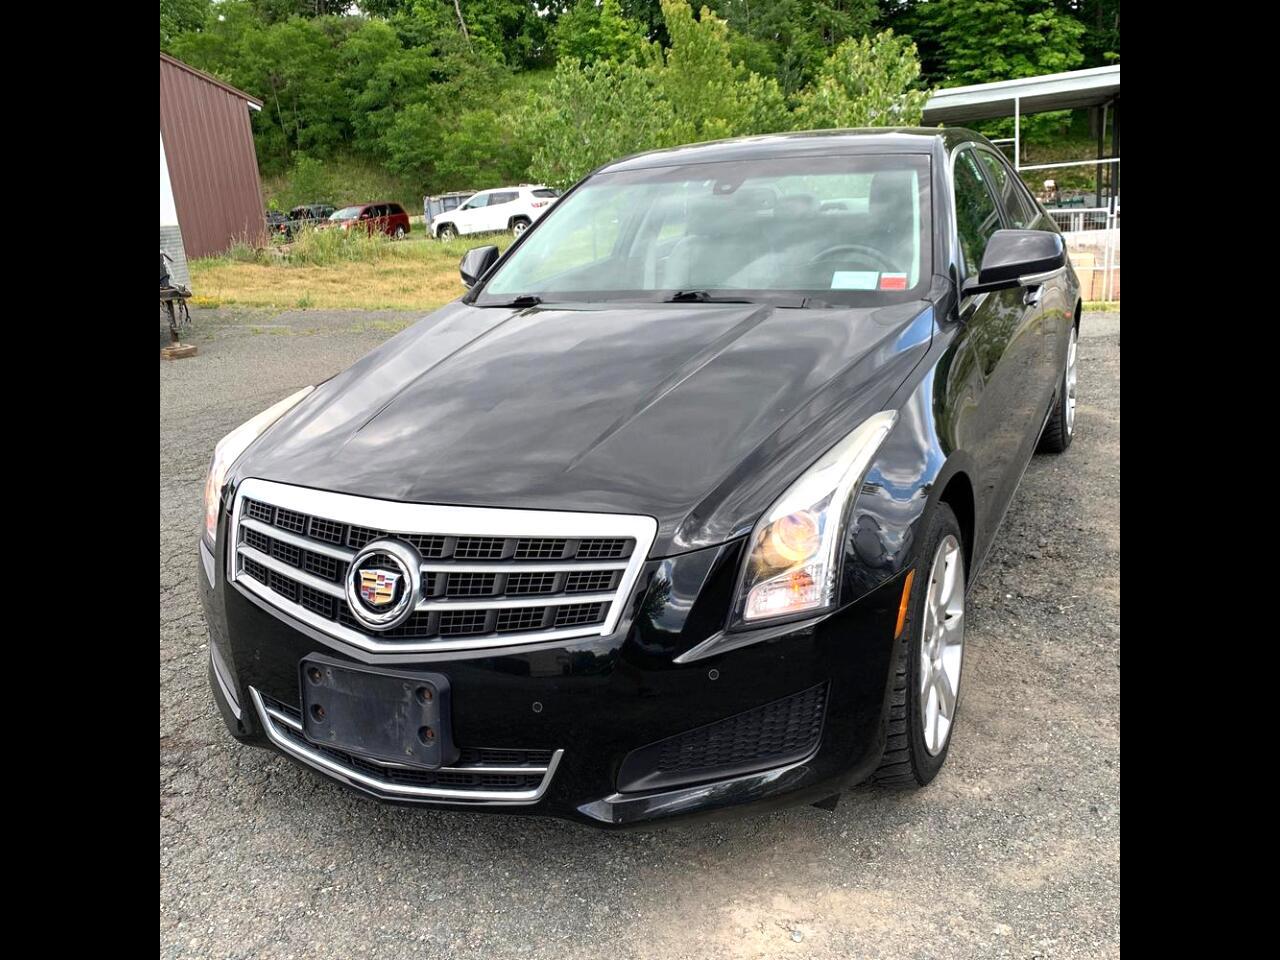 Cadillac ATS 4dr Sdn 2.0L Luxury AWD 2013